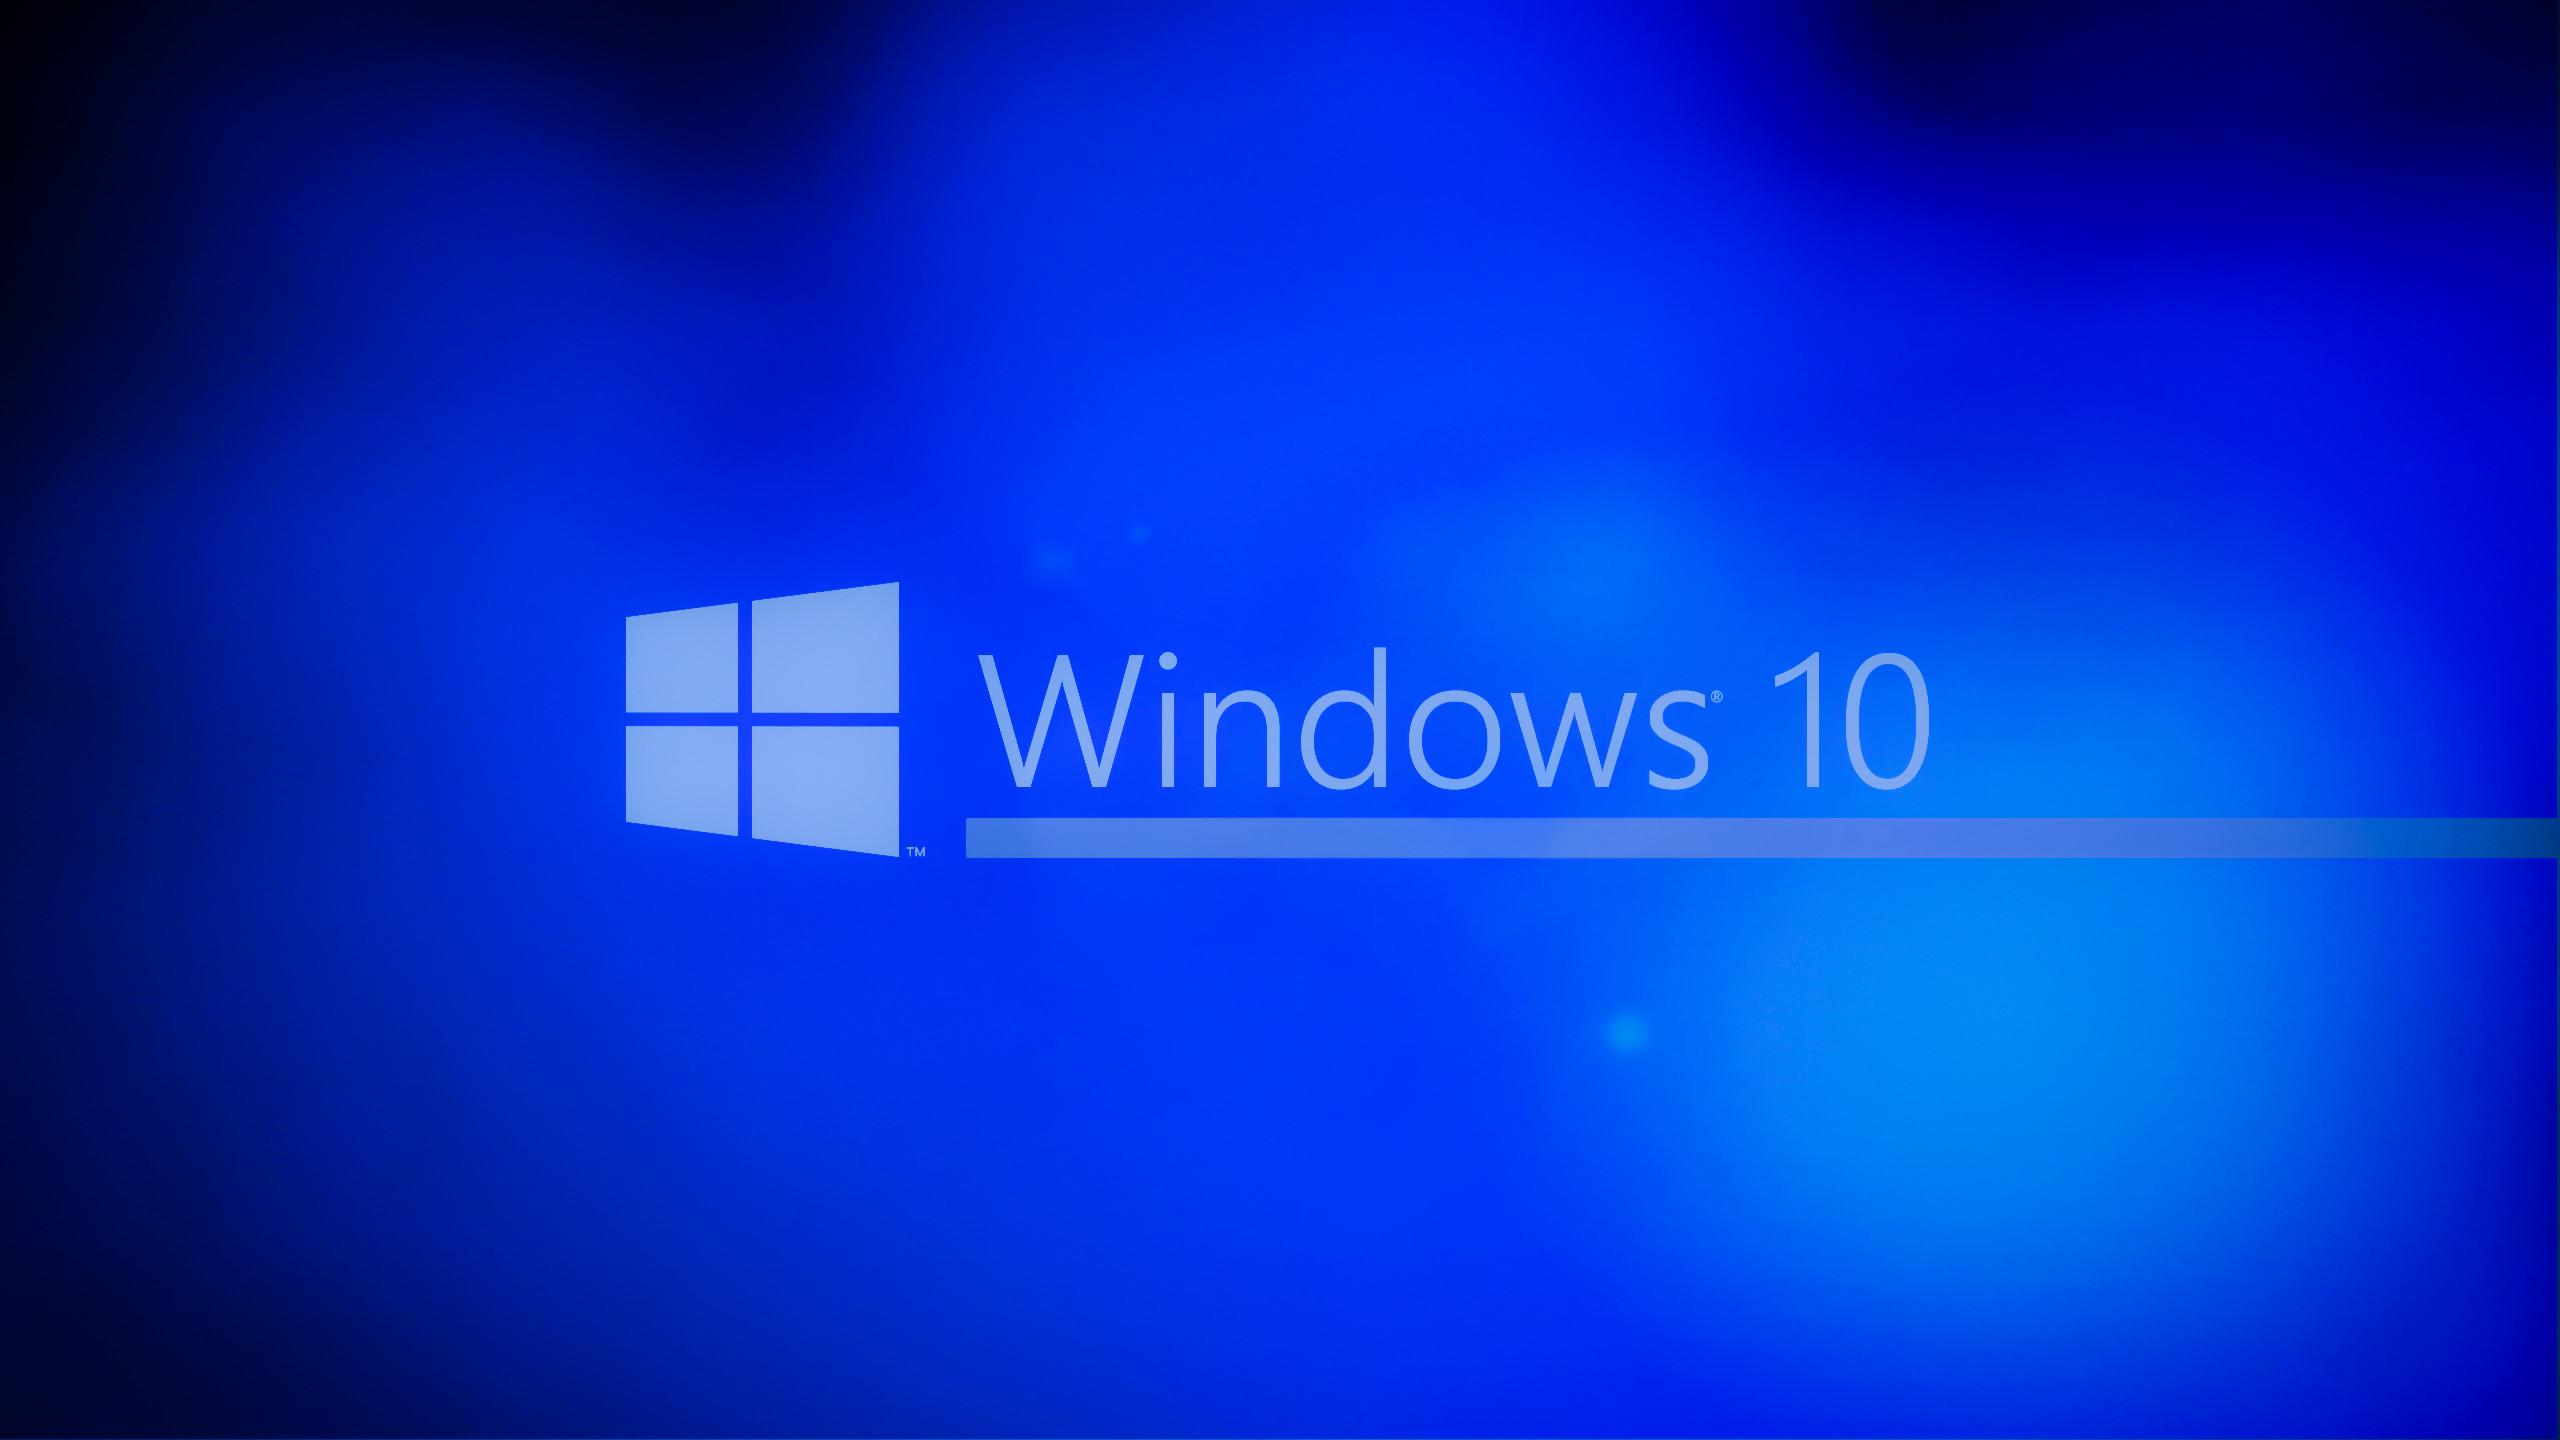 Windows 10 Wallpaper, Logo, Start – HD Wallpapers, Ultra HD Wallpapers